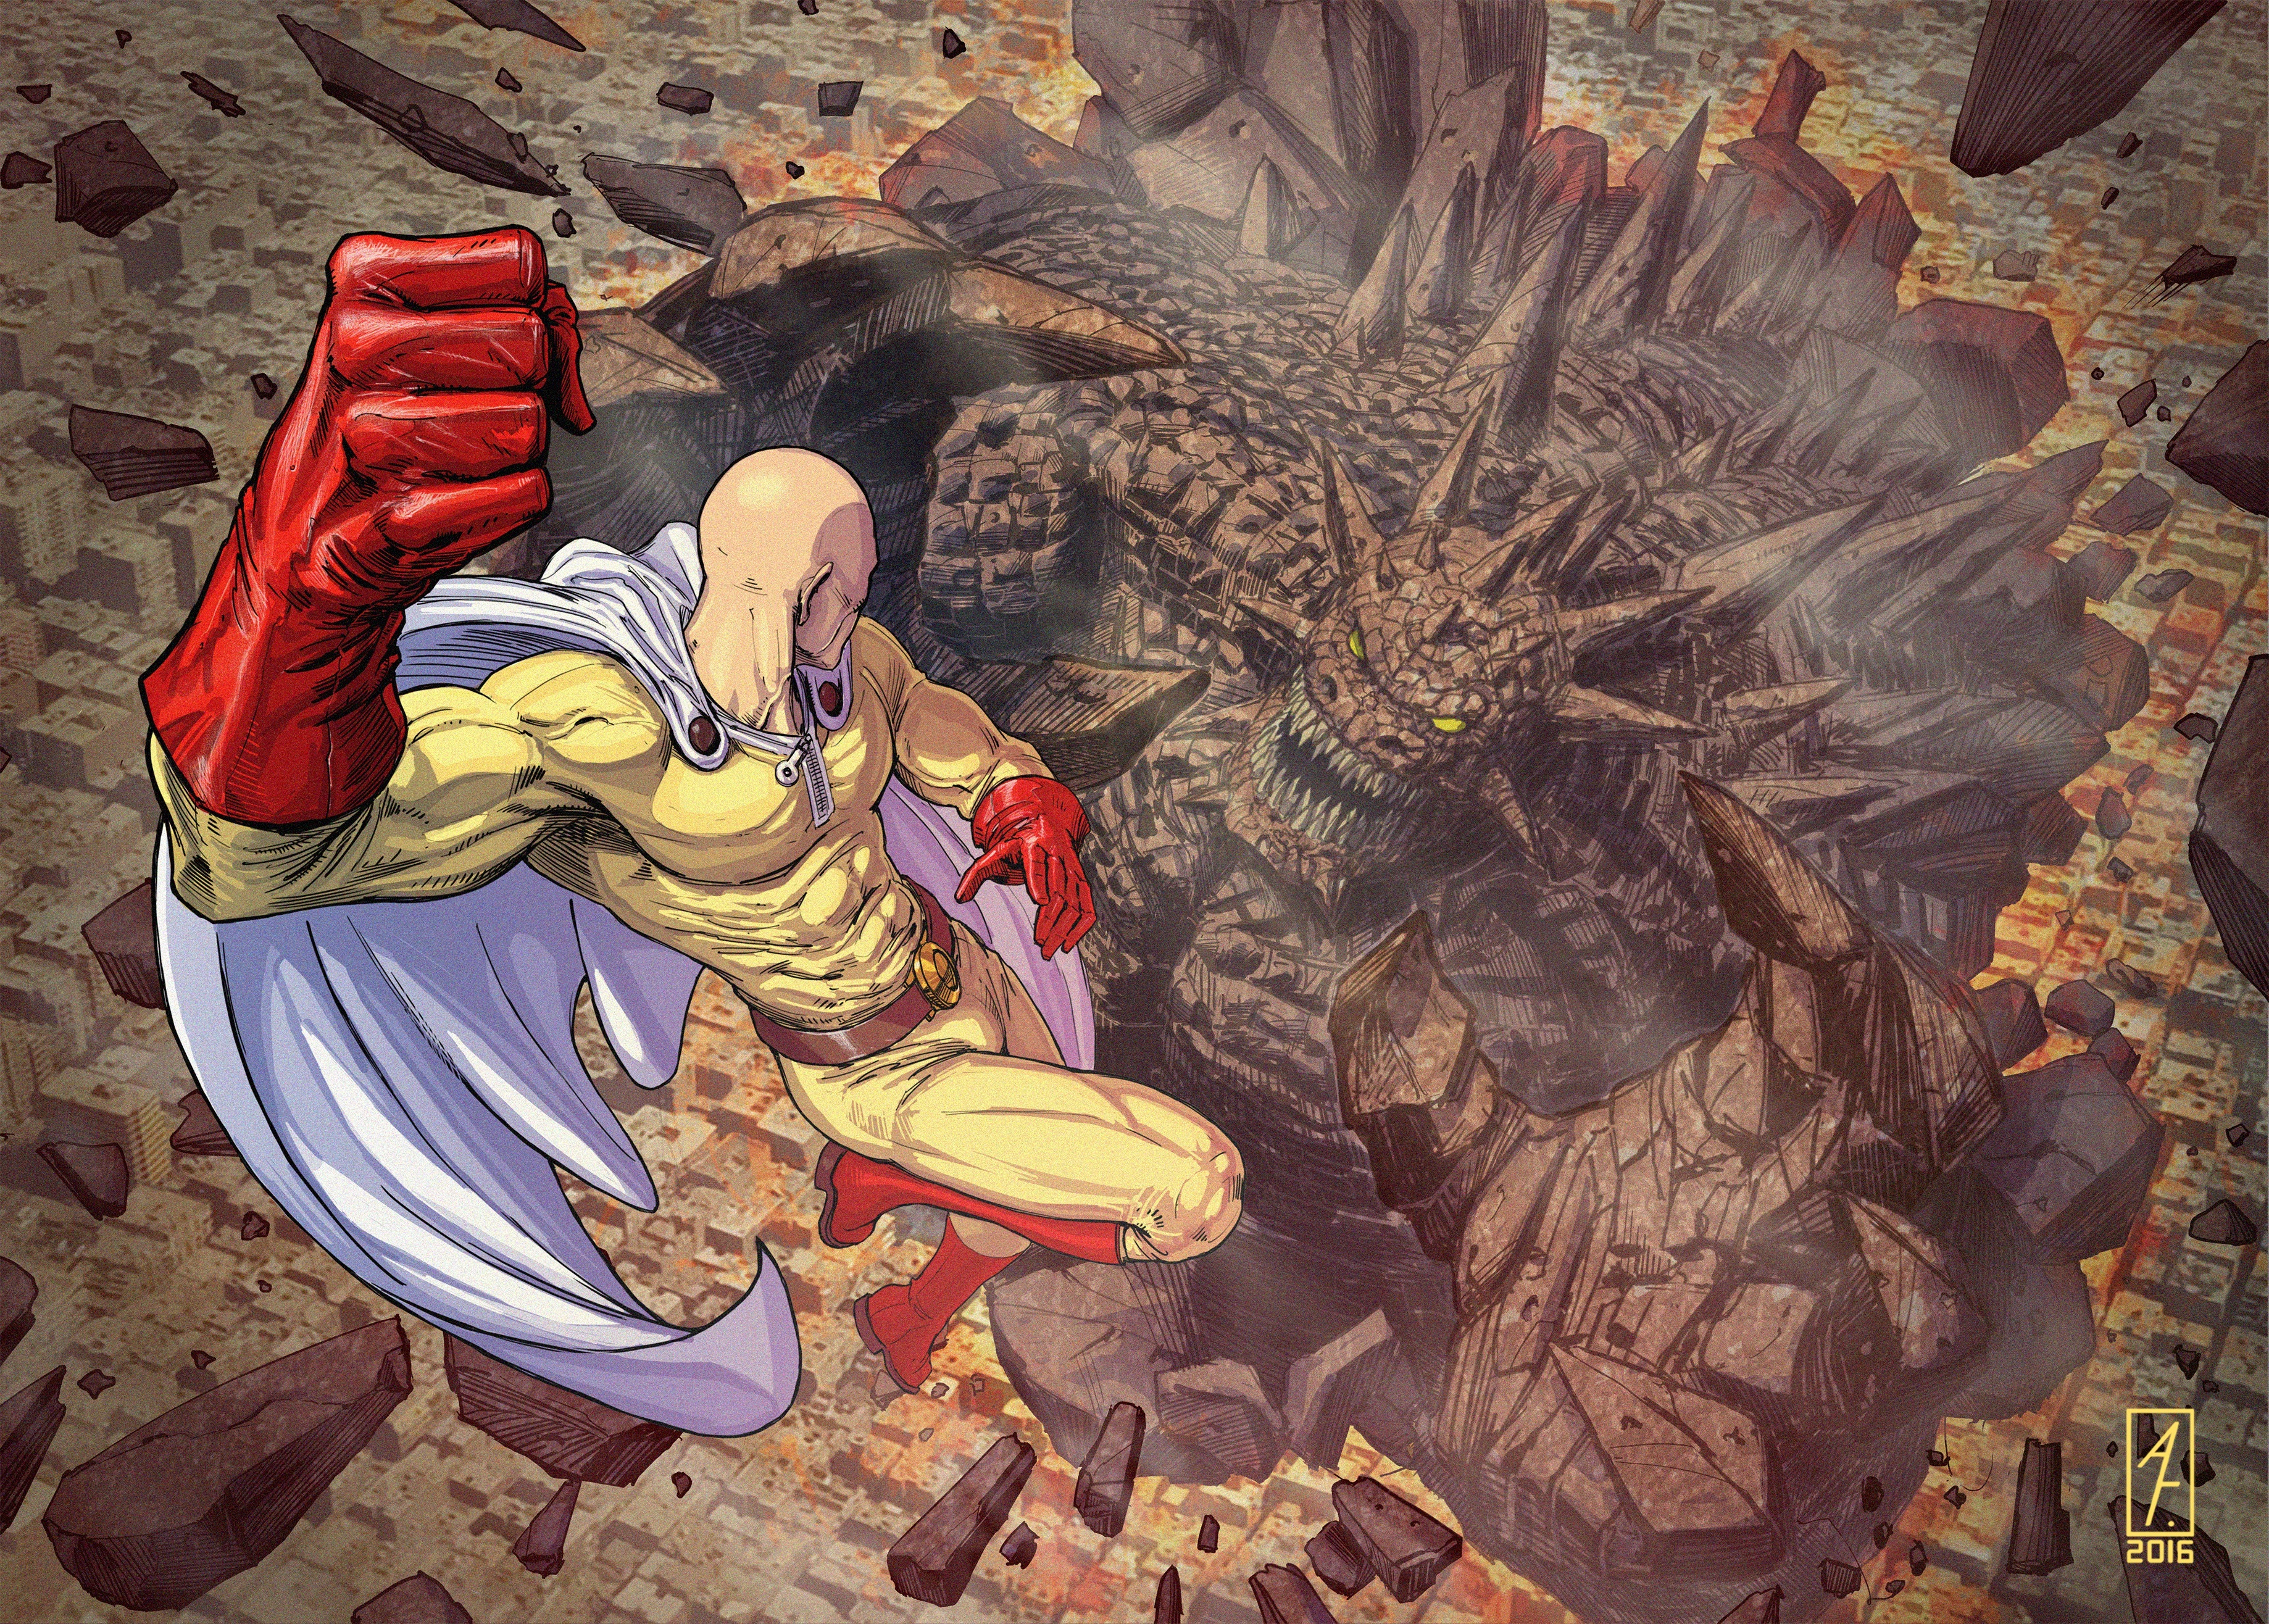 Saitama one punch man 4k hd anime 4k wallpapers images - Funny one punch man wallpaper ...